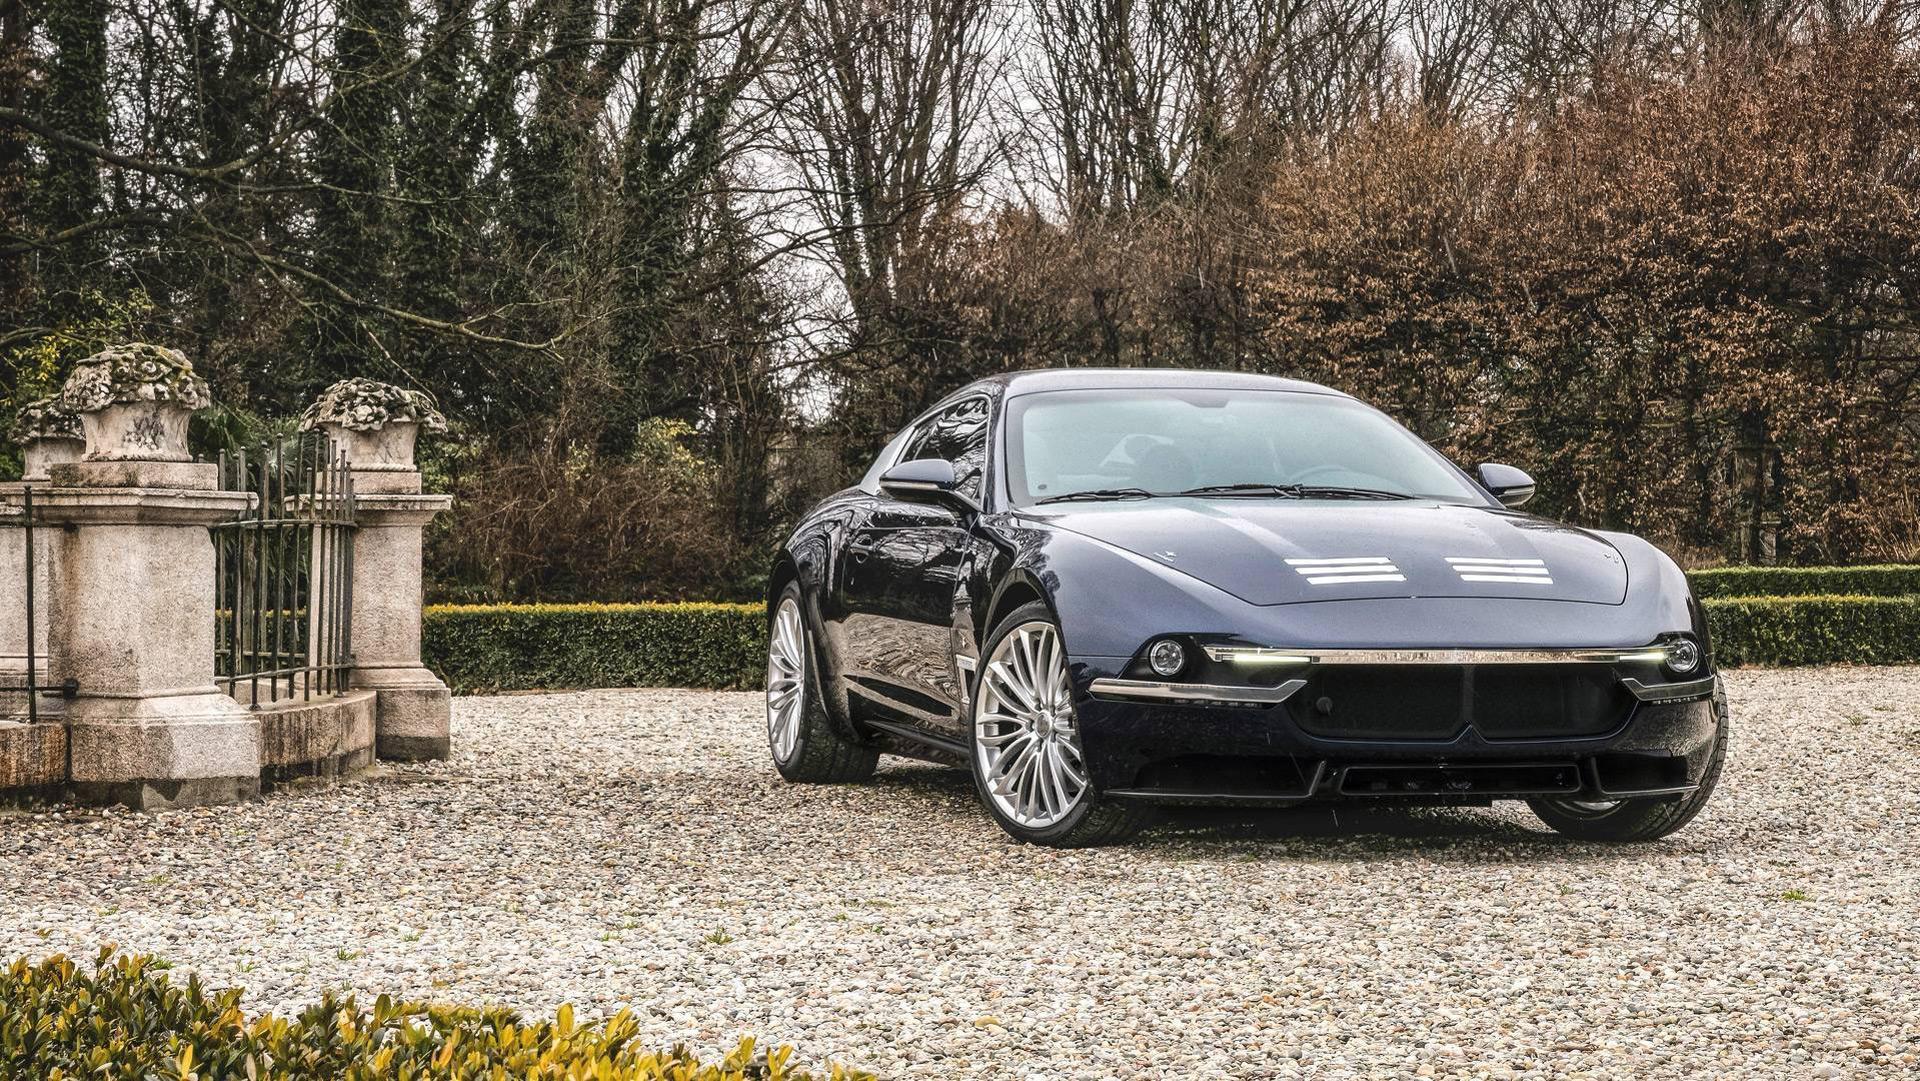 Touring Superleggera Returns With Maserati Based Sciadipersia